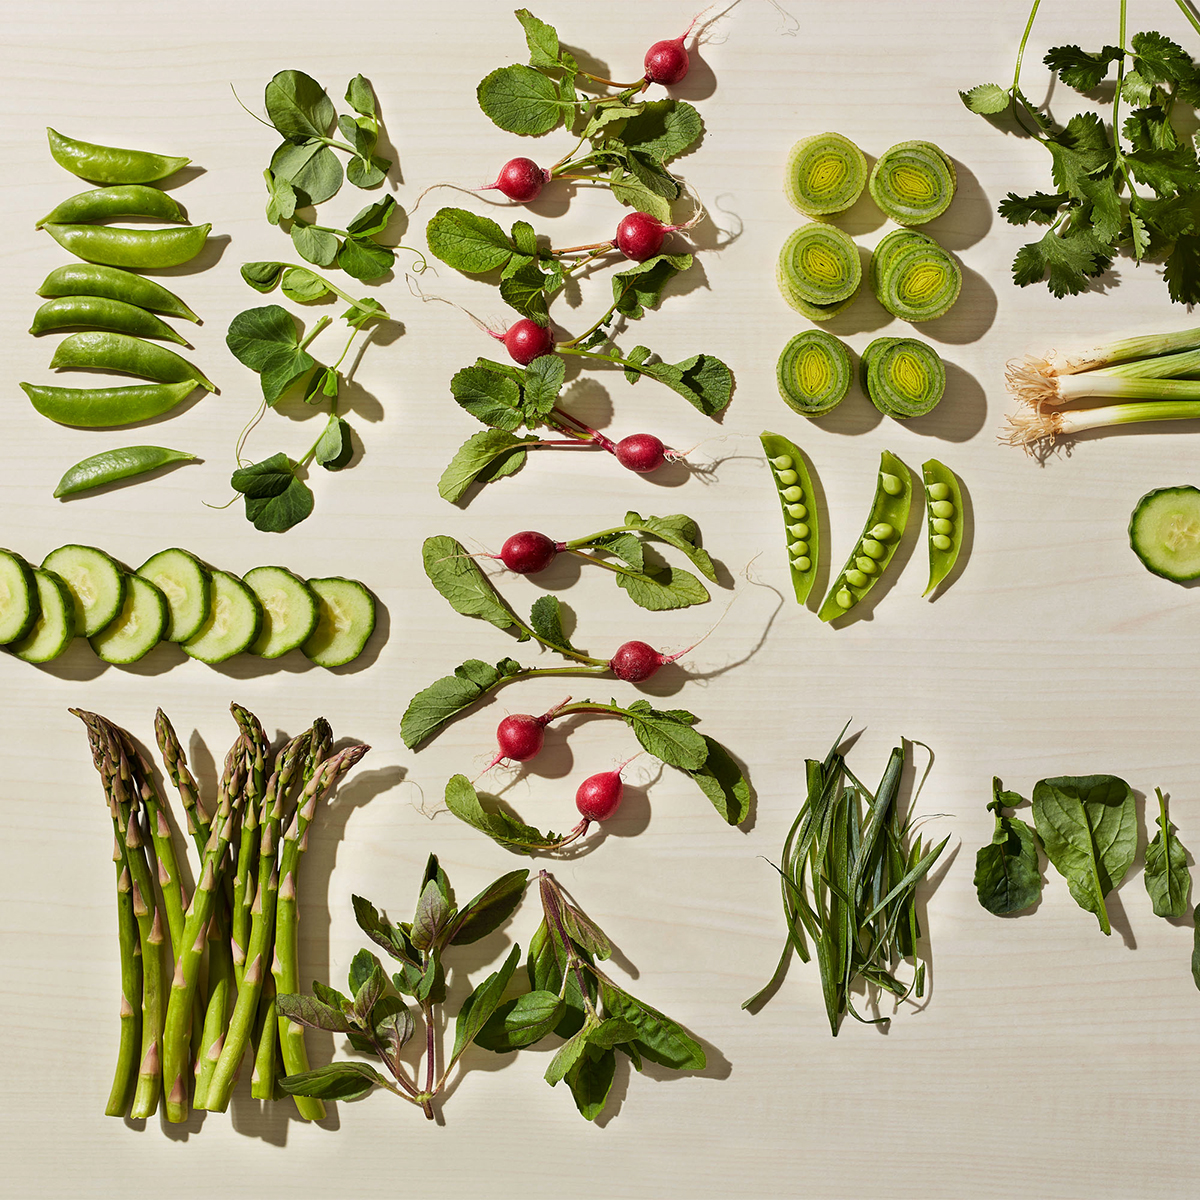 go green vegetables arranged on table